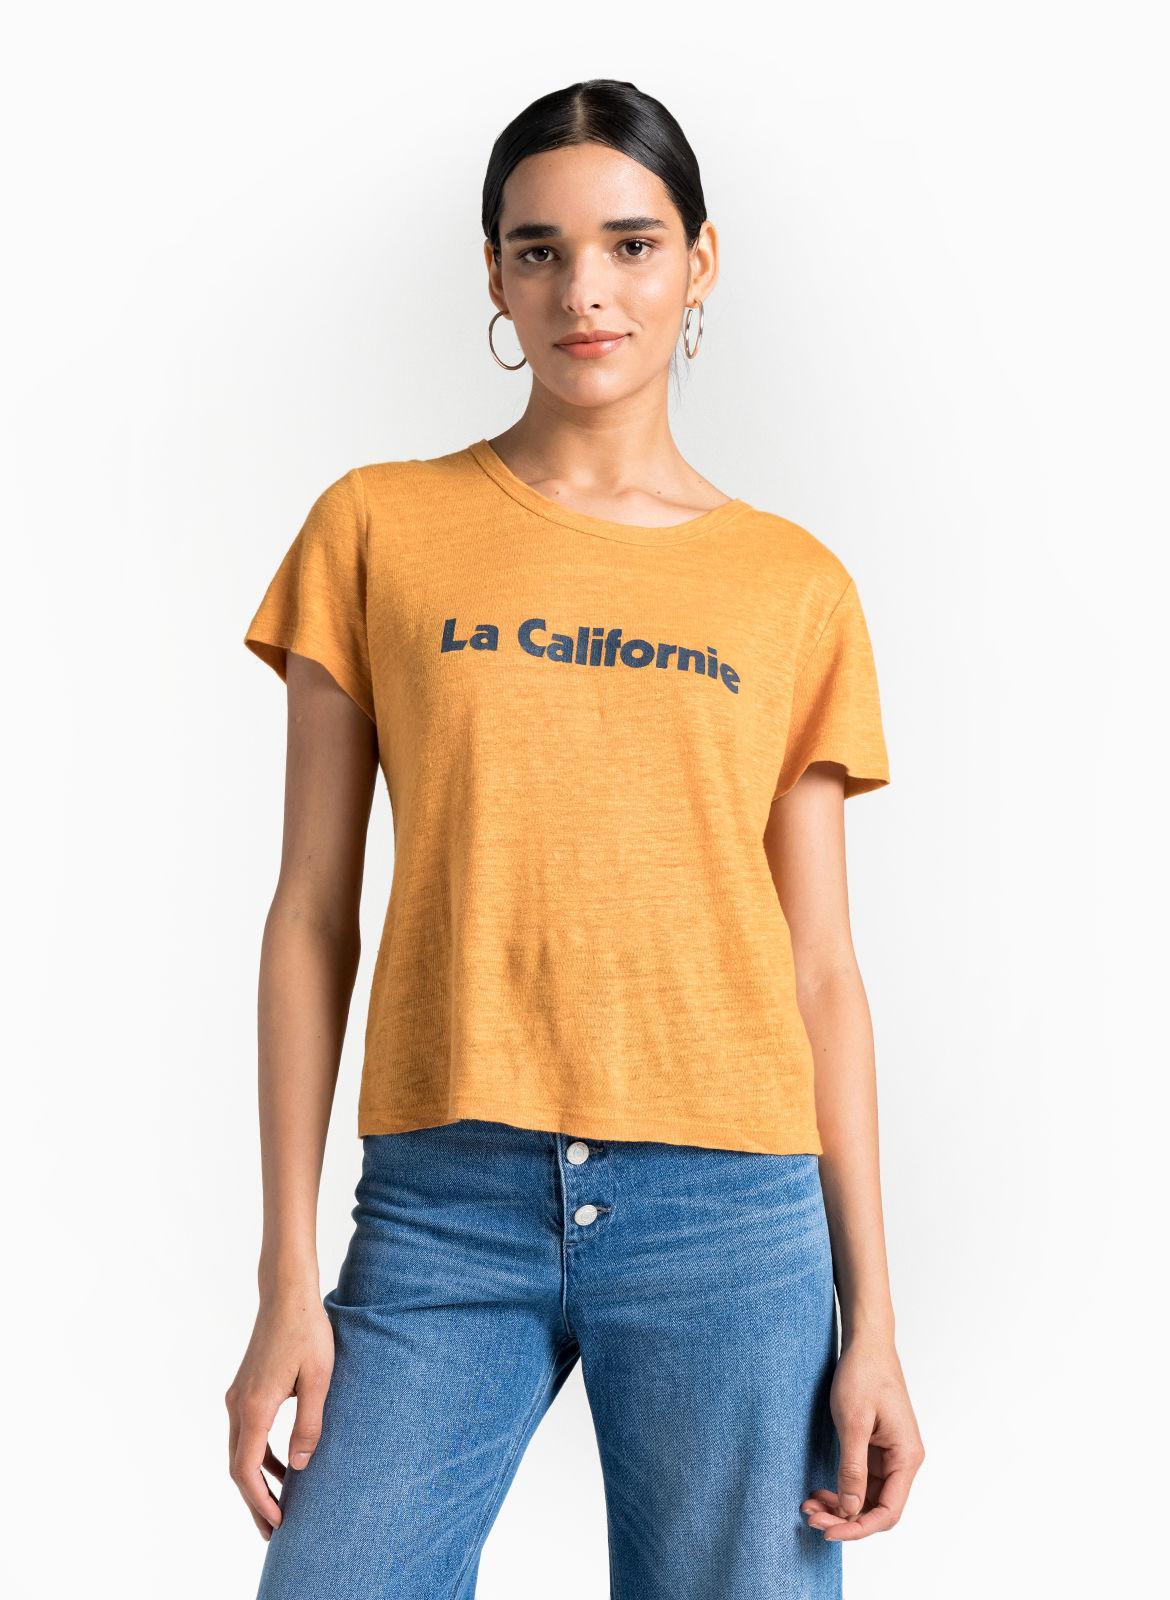 070a16b2b346 Lyst - A.L.C. La Californie Tee in Orange